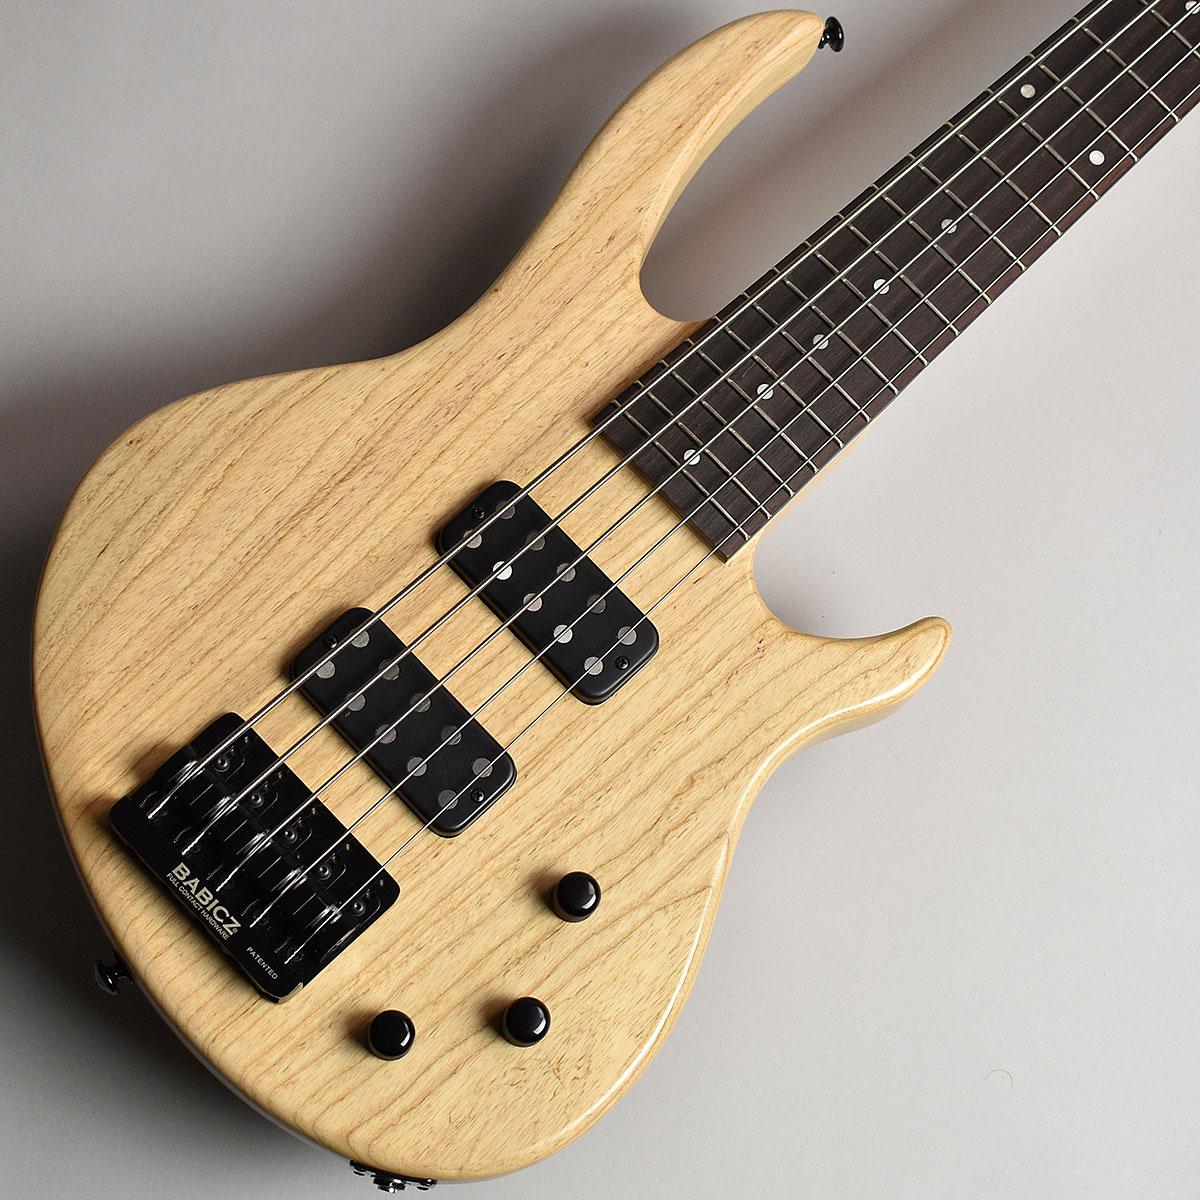 Gibson EB Bass 5-String 2018 Natural Satin S/N:180045178 エレキベース 【ギブソン】【未展示品】